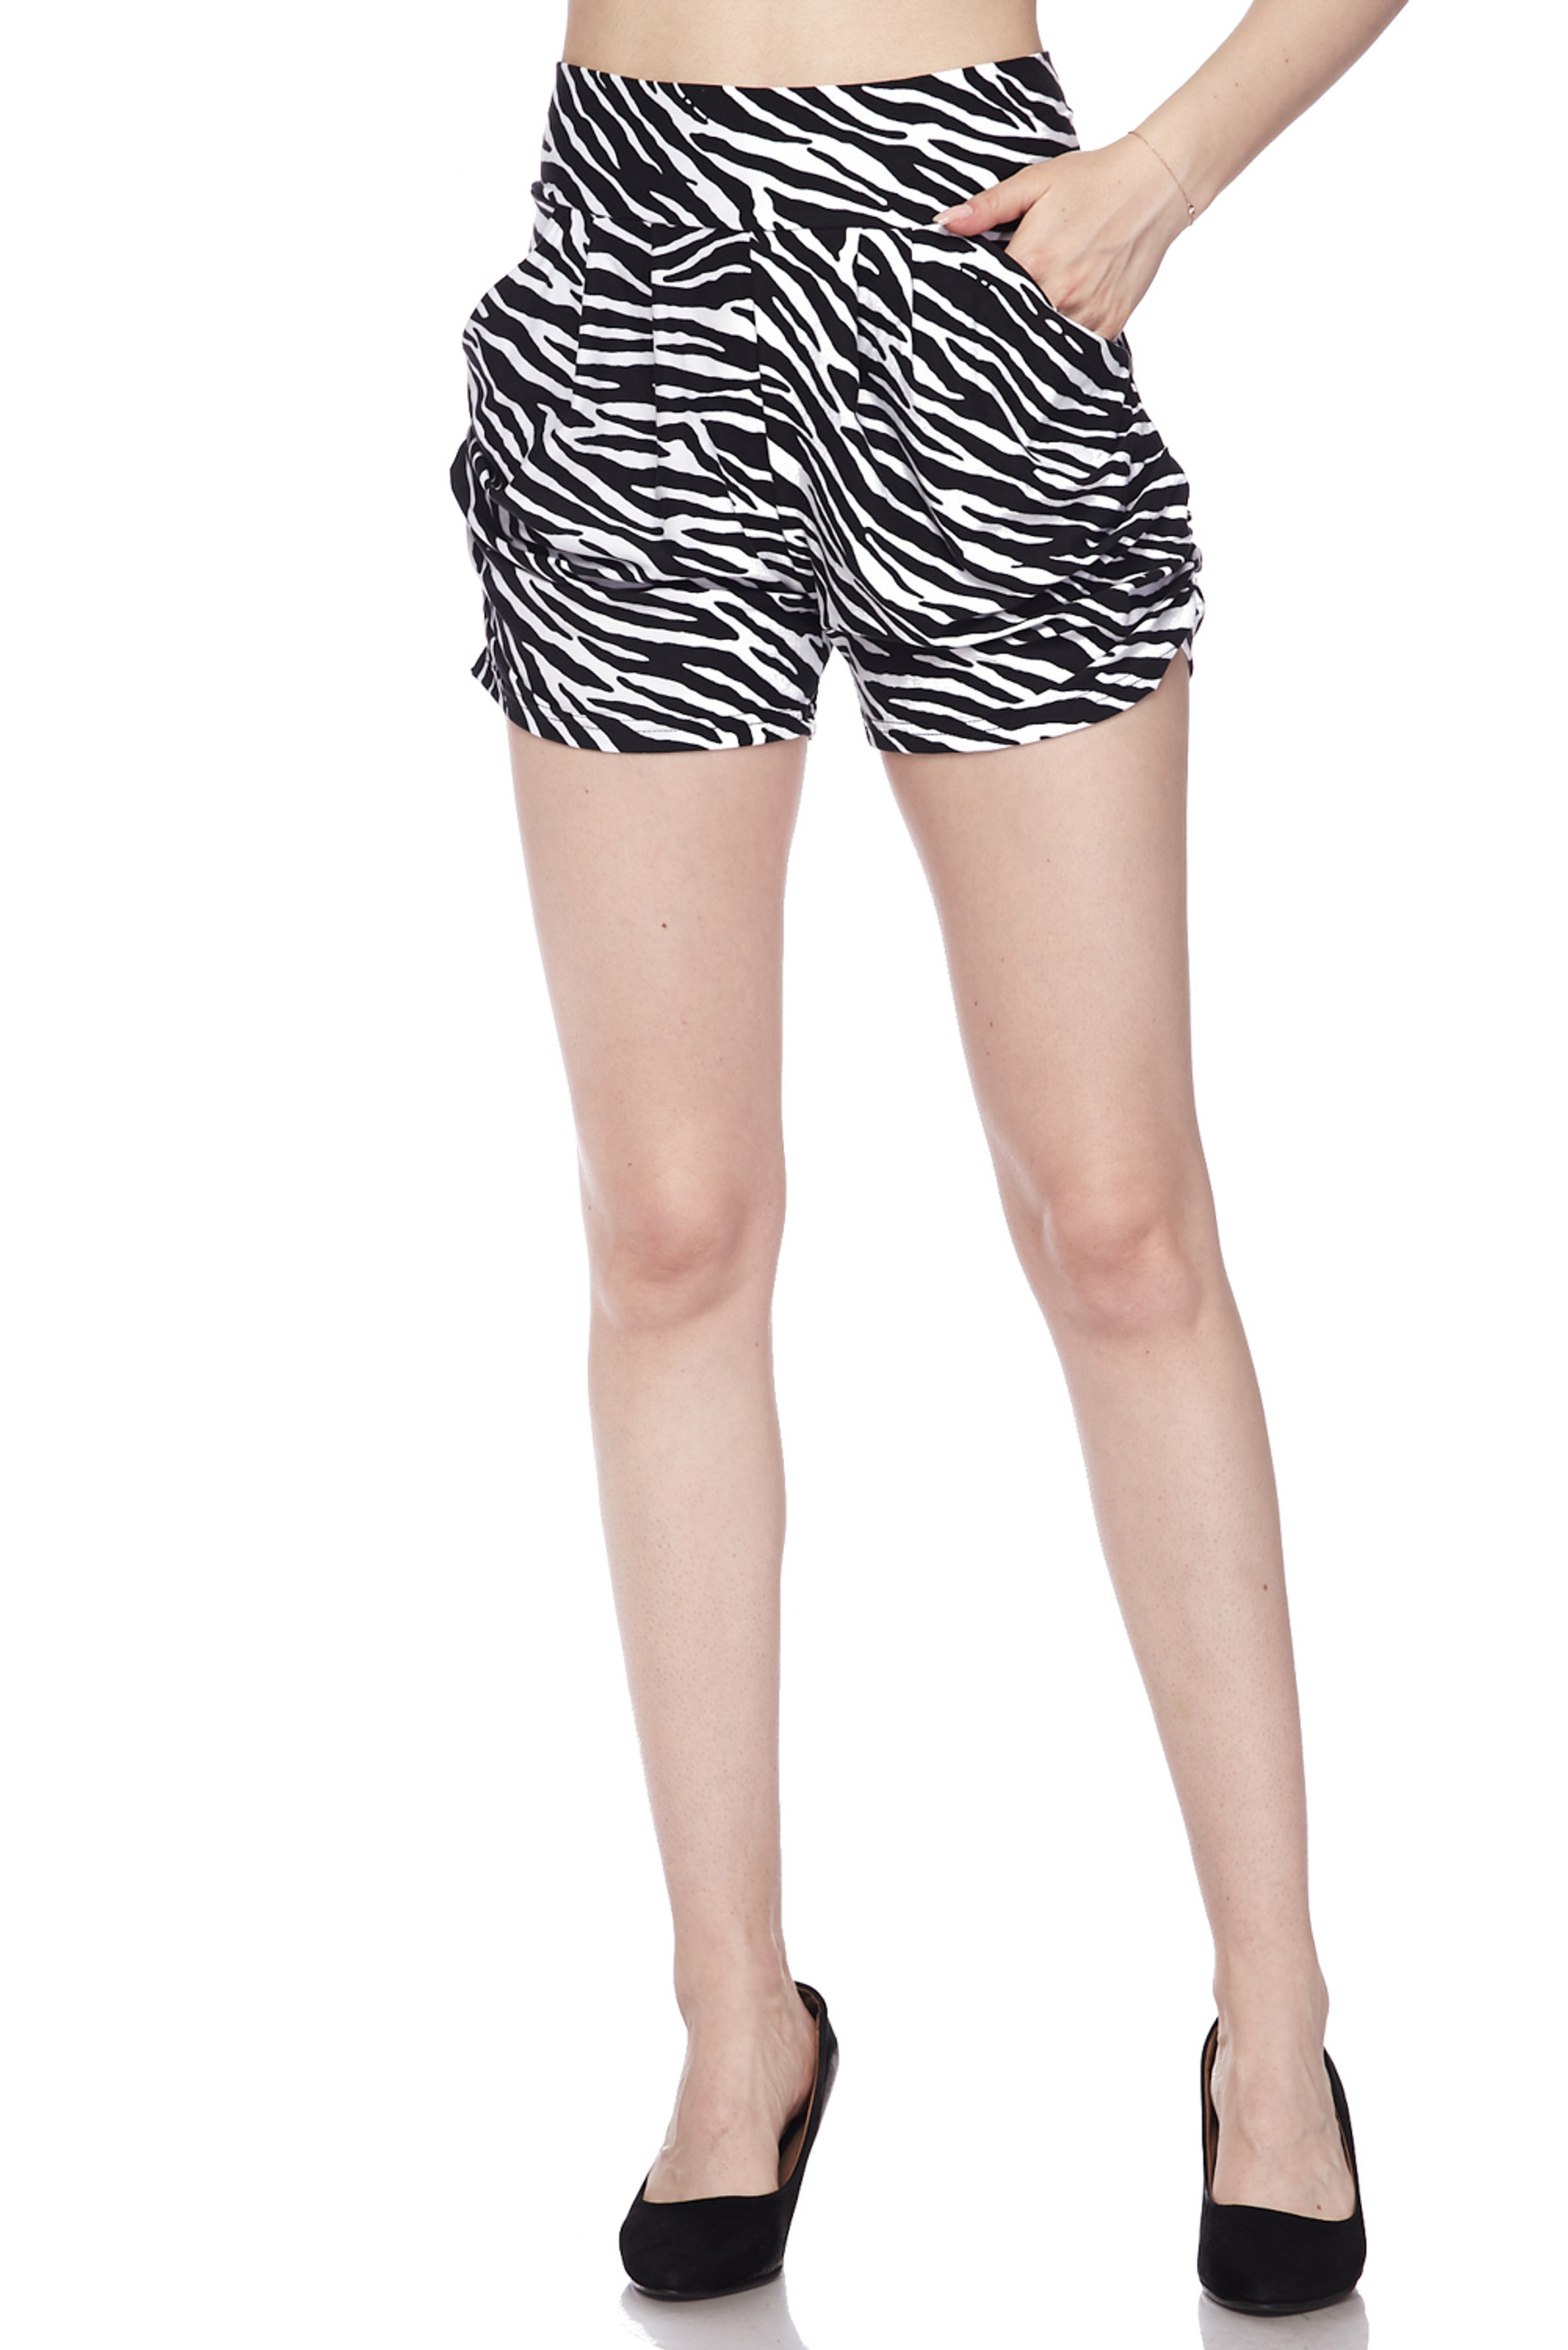 Brushed  Zebra Print Harem Shorts